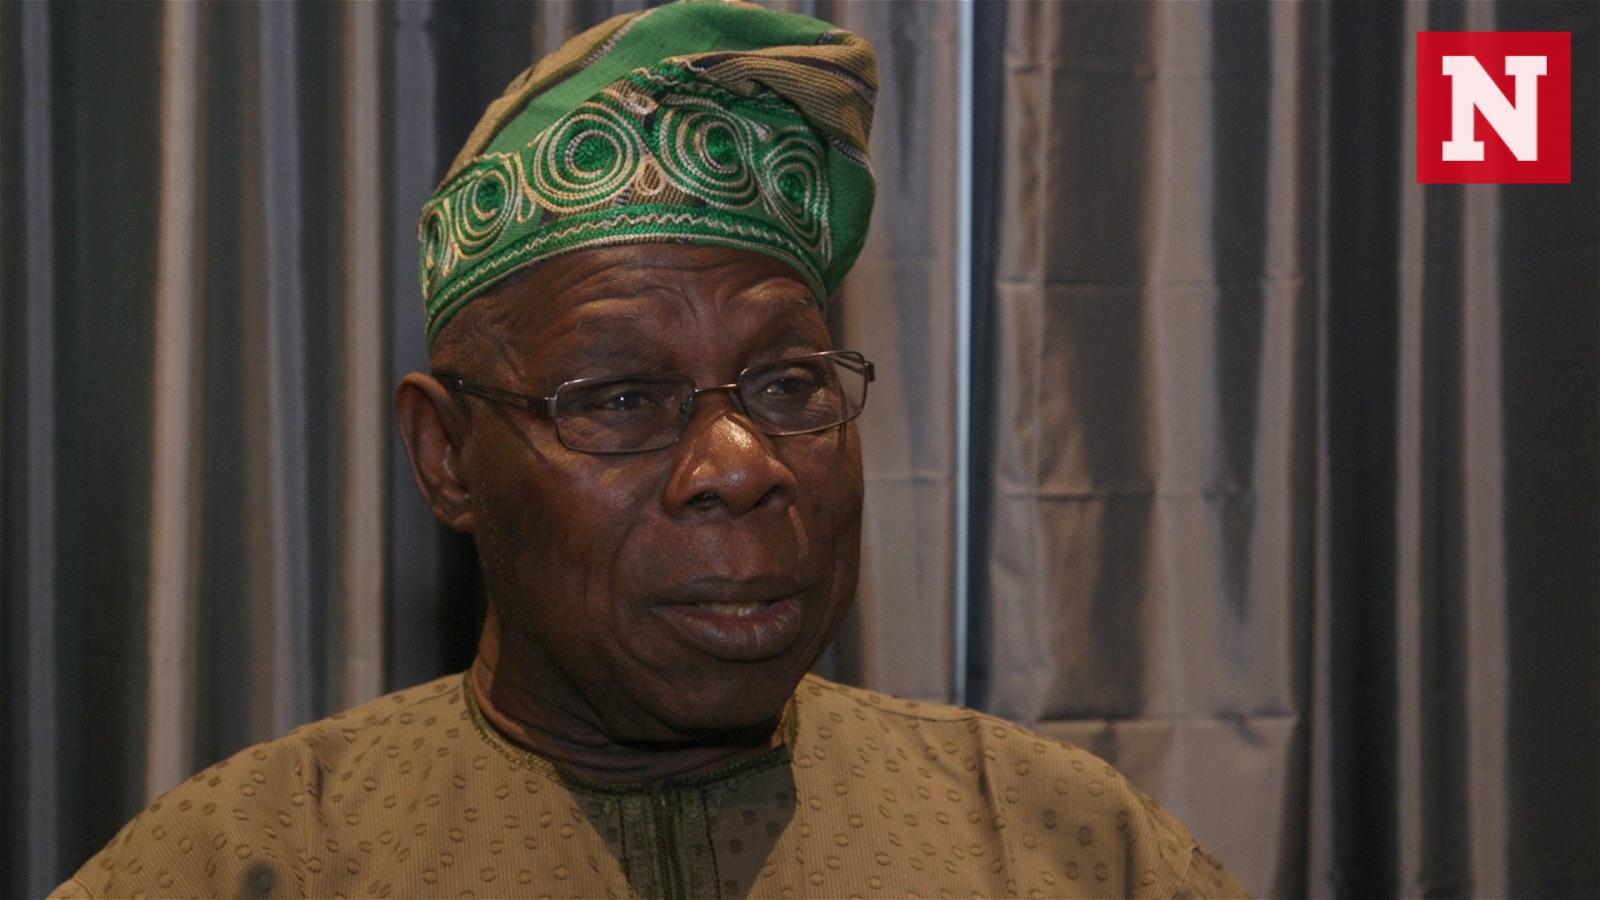 nigeria-president-buhari-must-meet-biafra-chief-nnamdi-kanu-says-former-leader-obasanjo